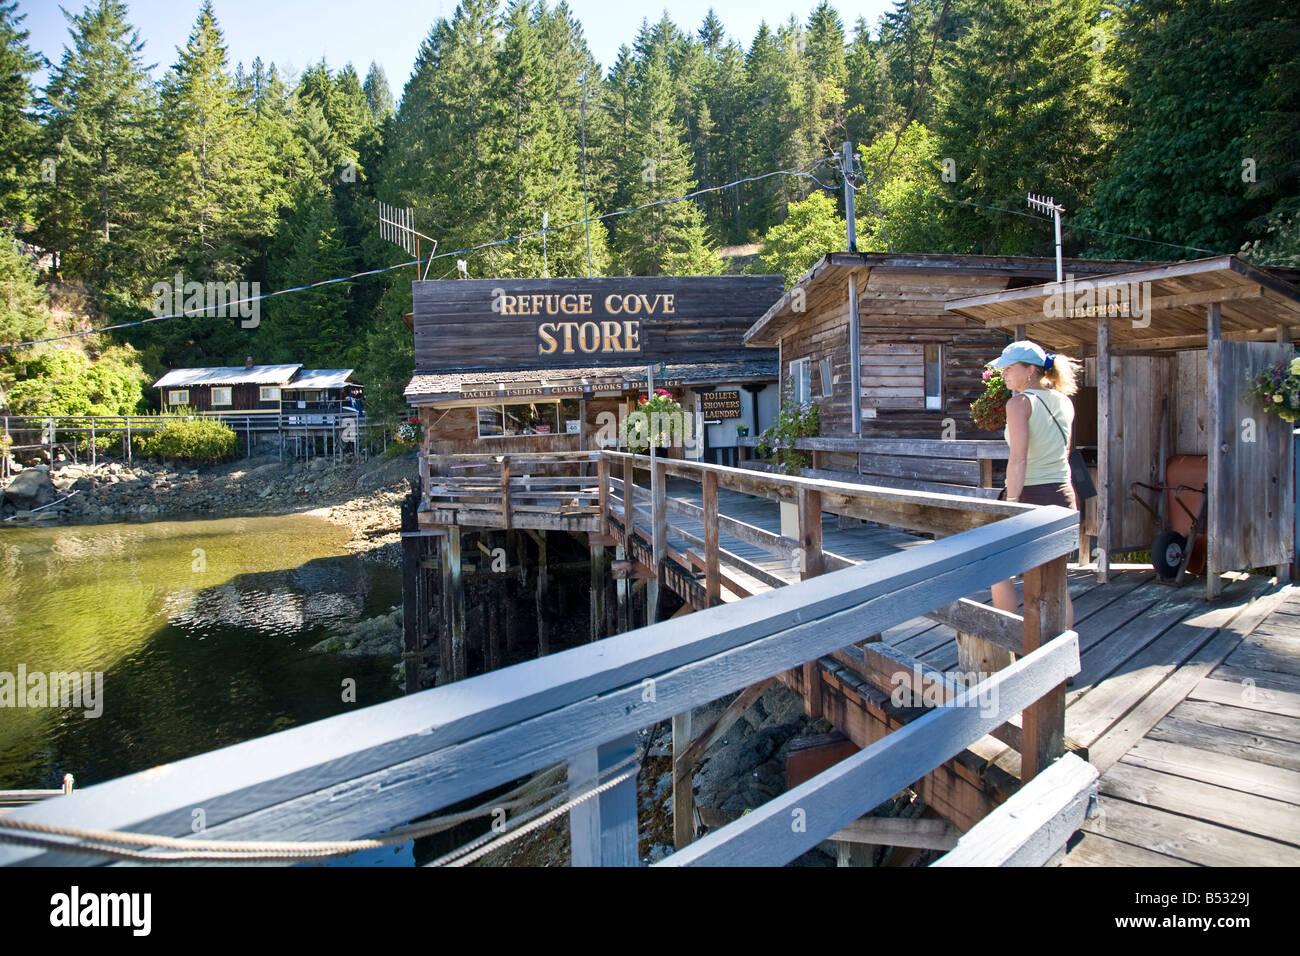 Refuge Cove Desolation Sound British Columbia Canada - Stock Image